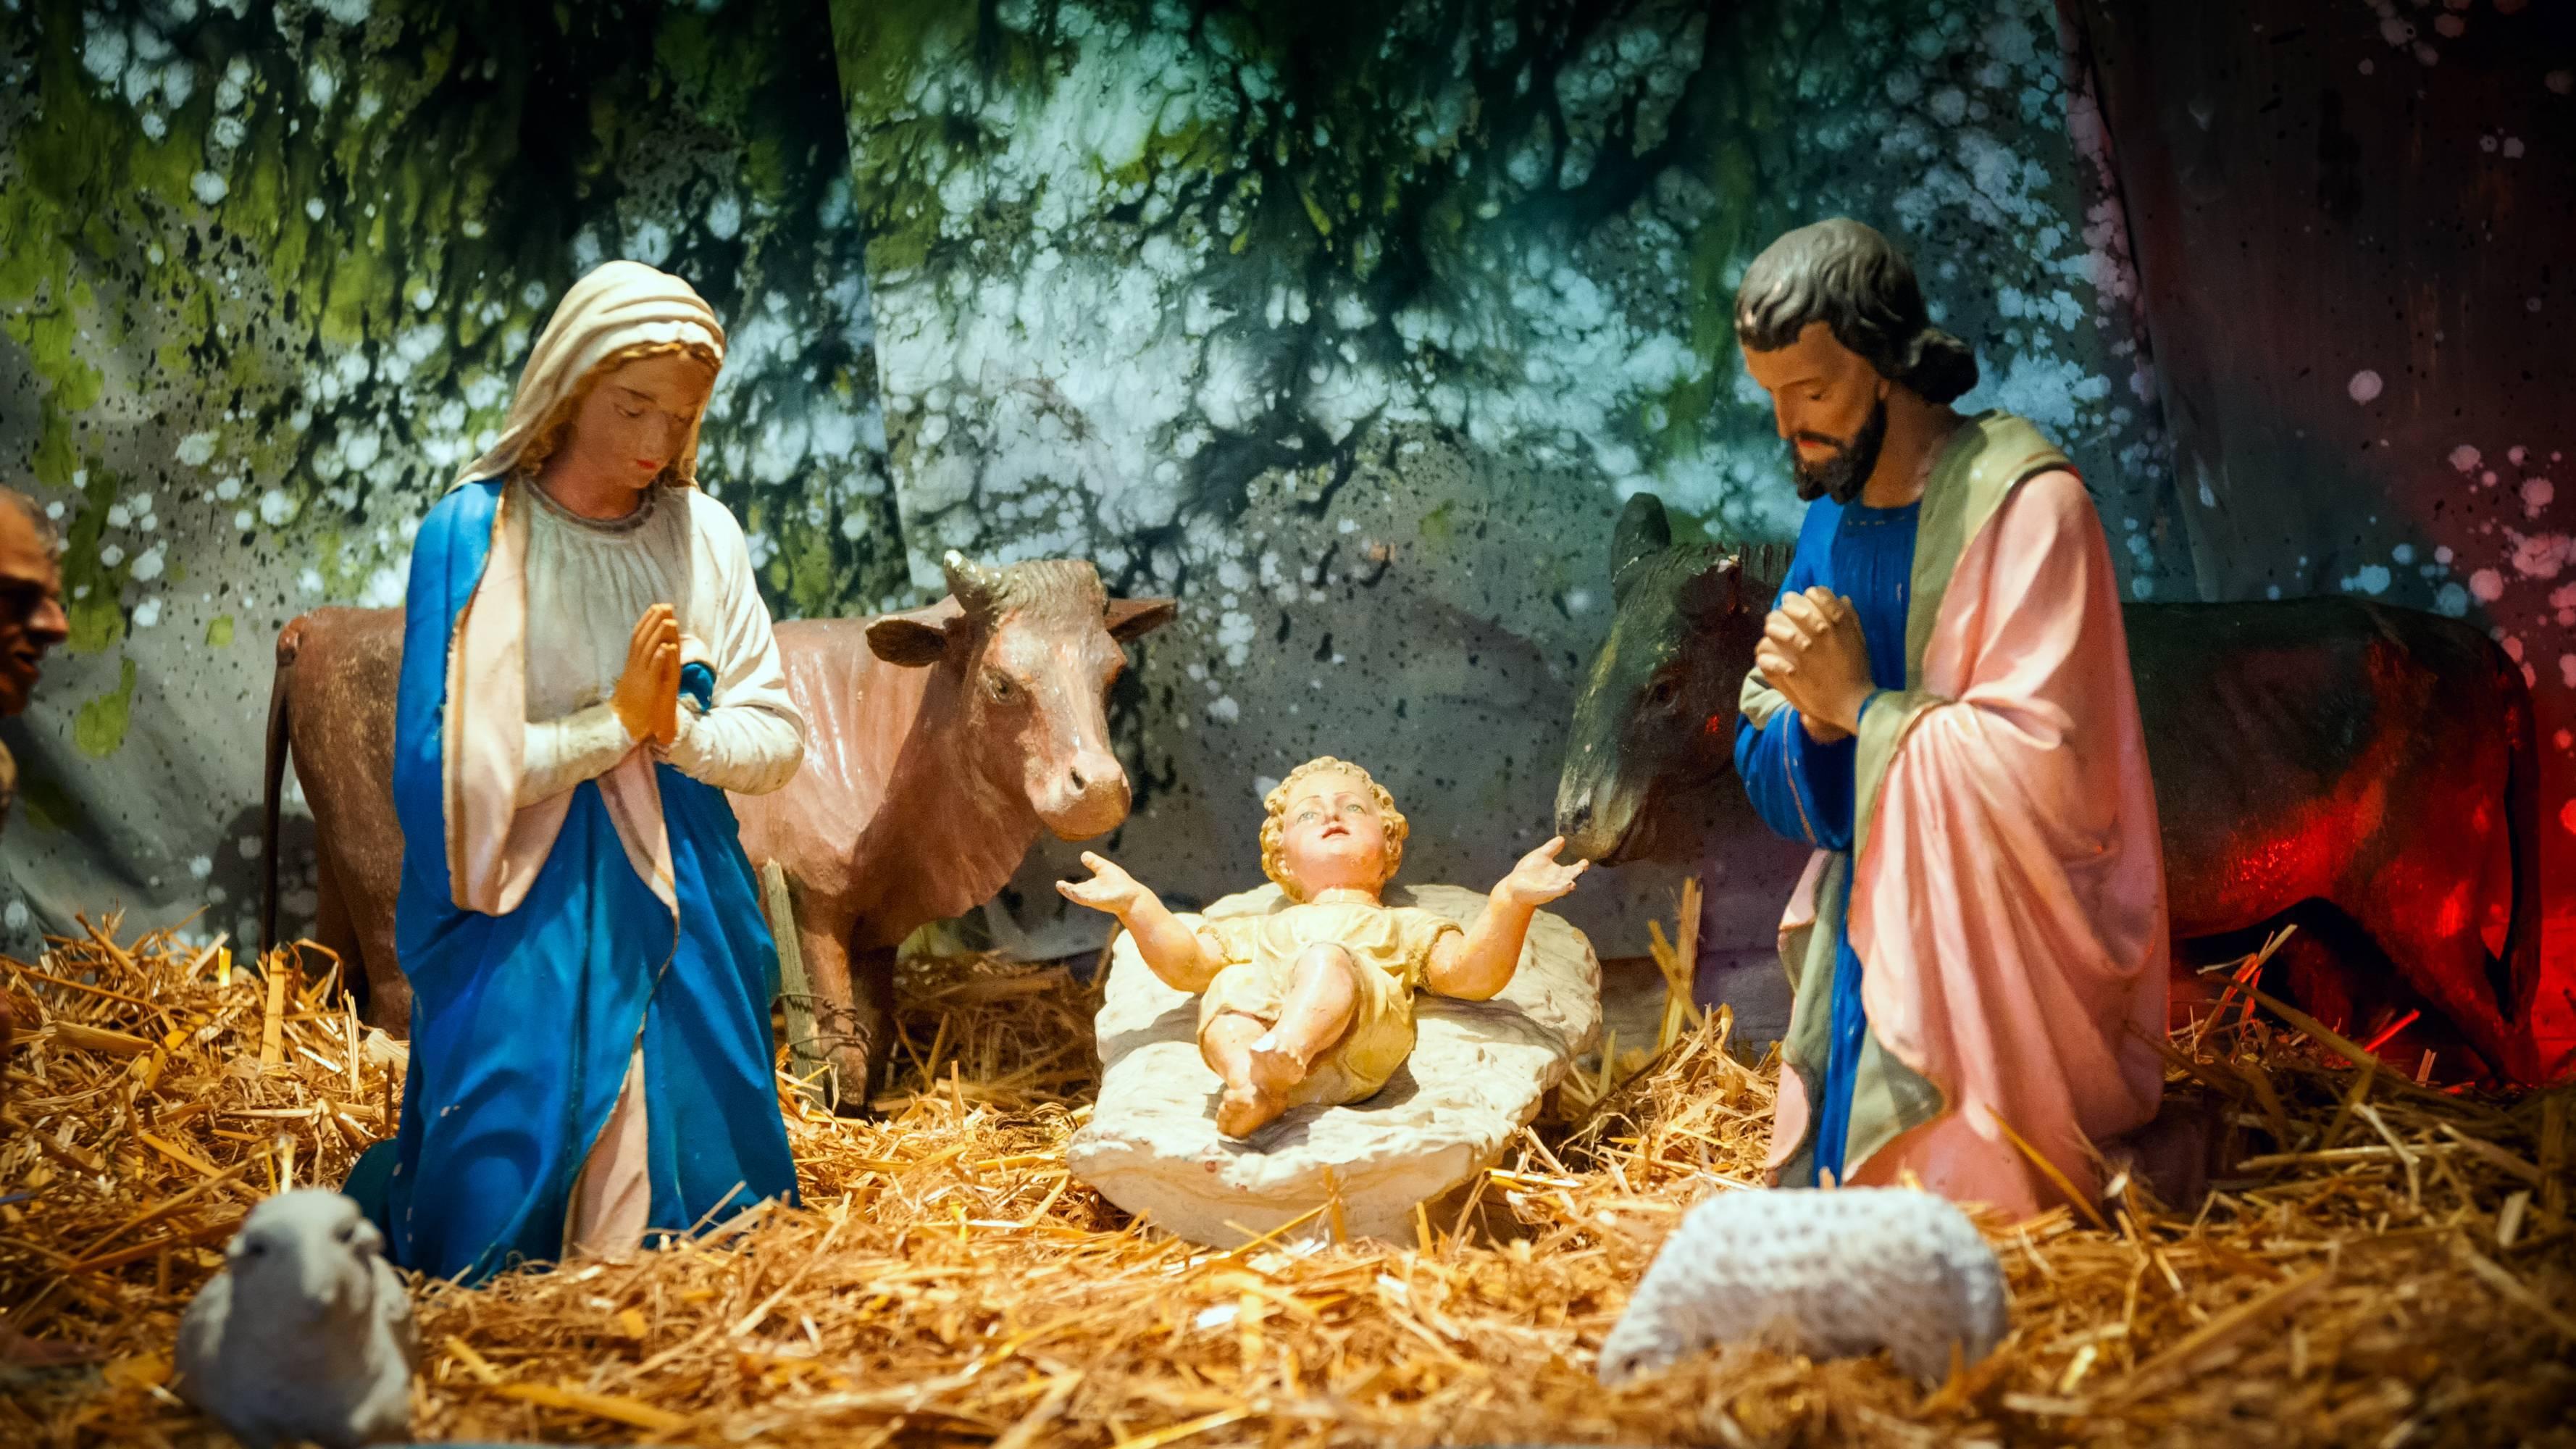 offrir un objet religieux à Noël